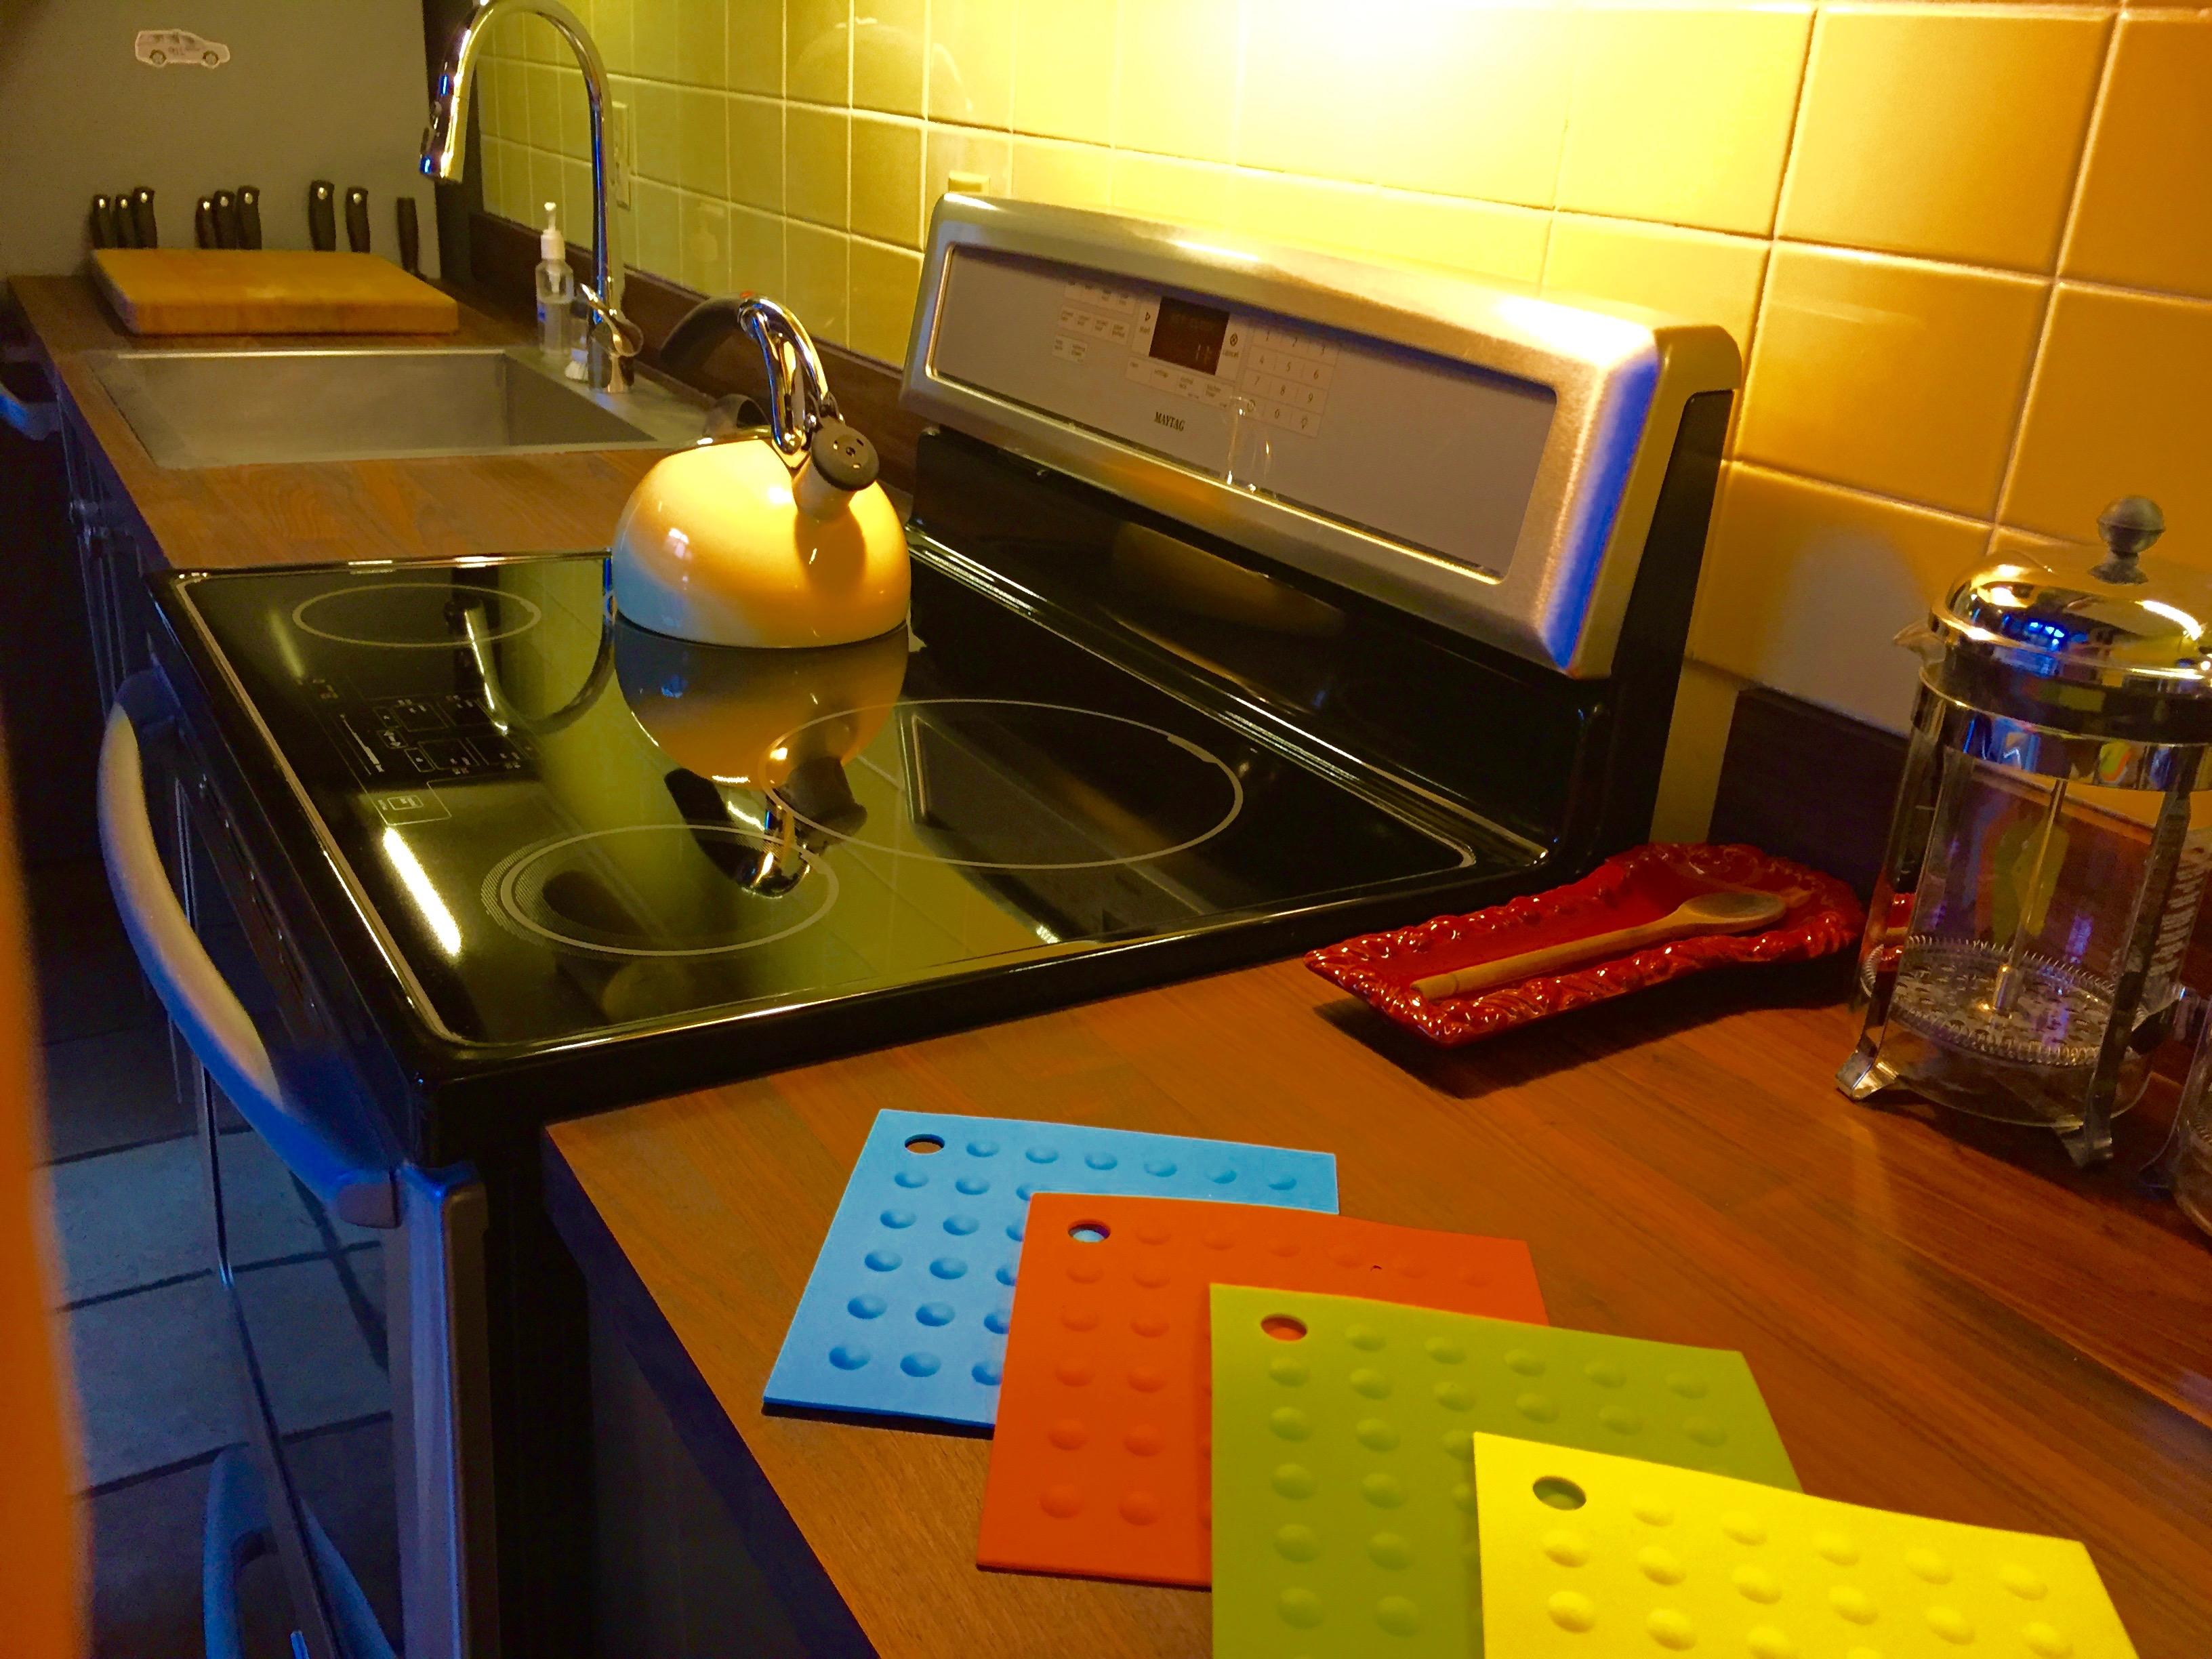 Kitchen, induction stove, walnut countertops